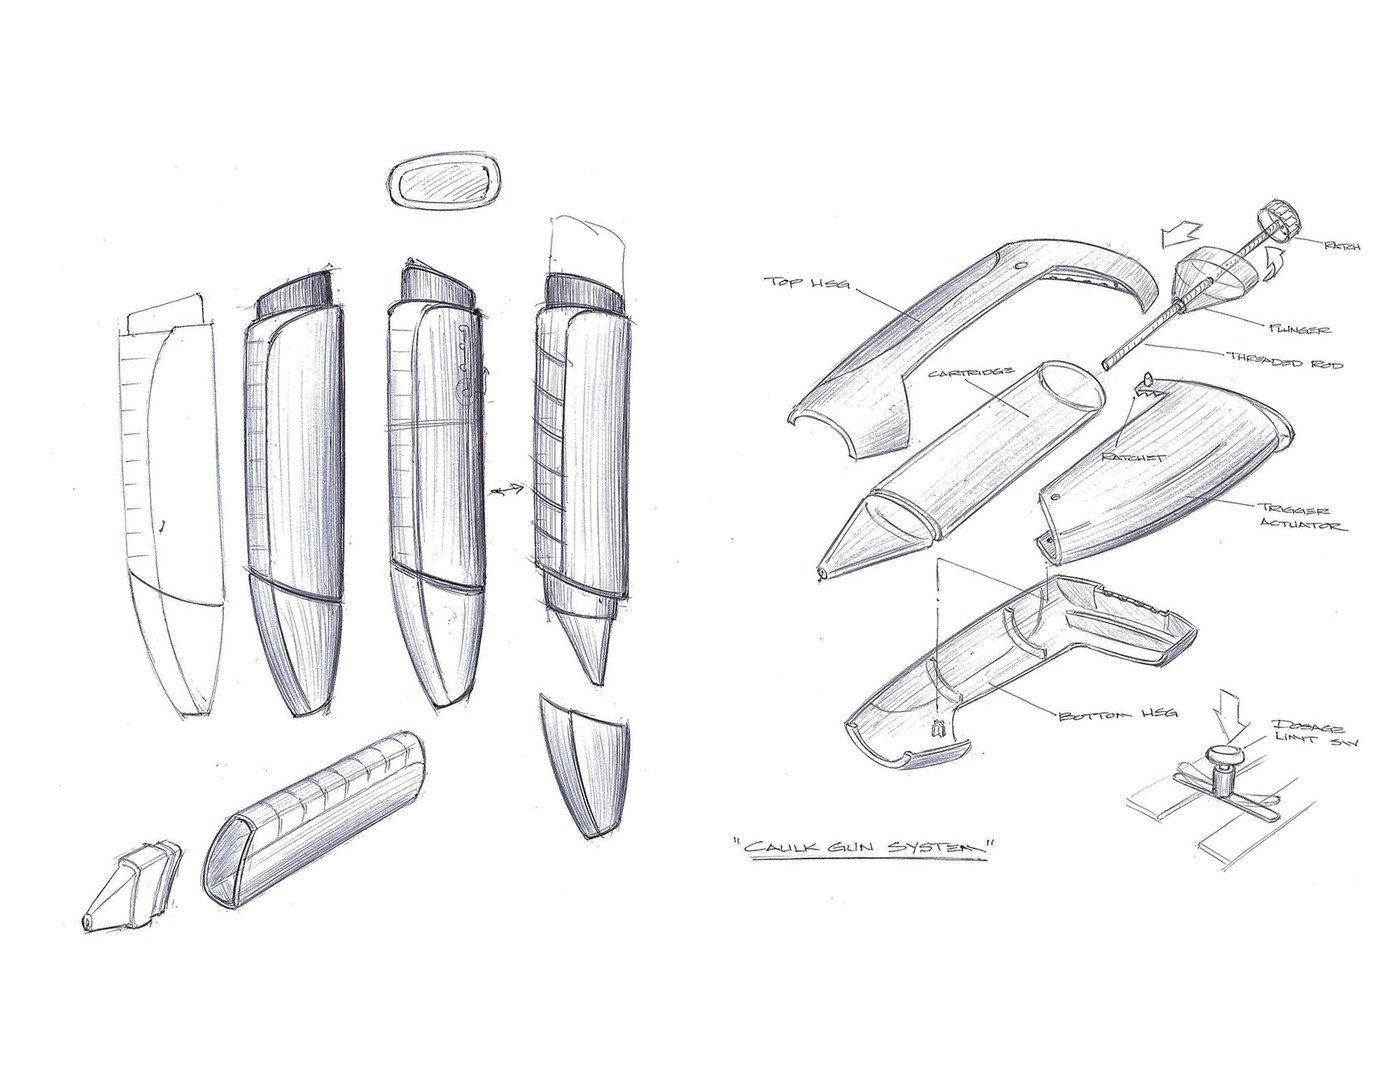 Sketches by Richard Costa at Coroflot.com